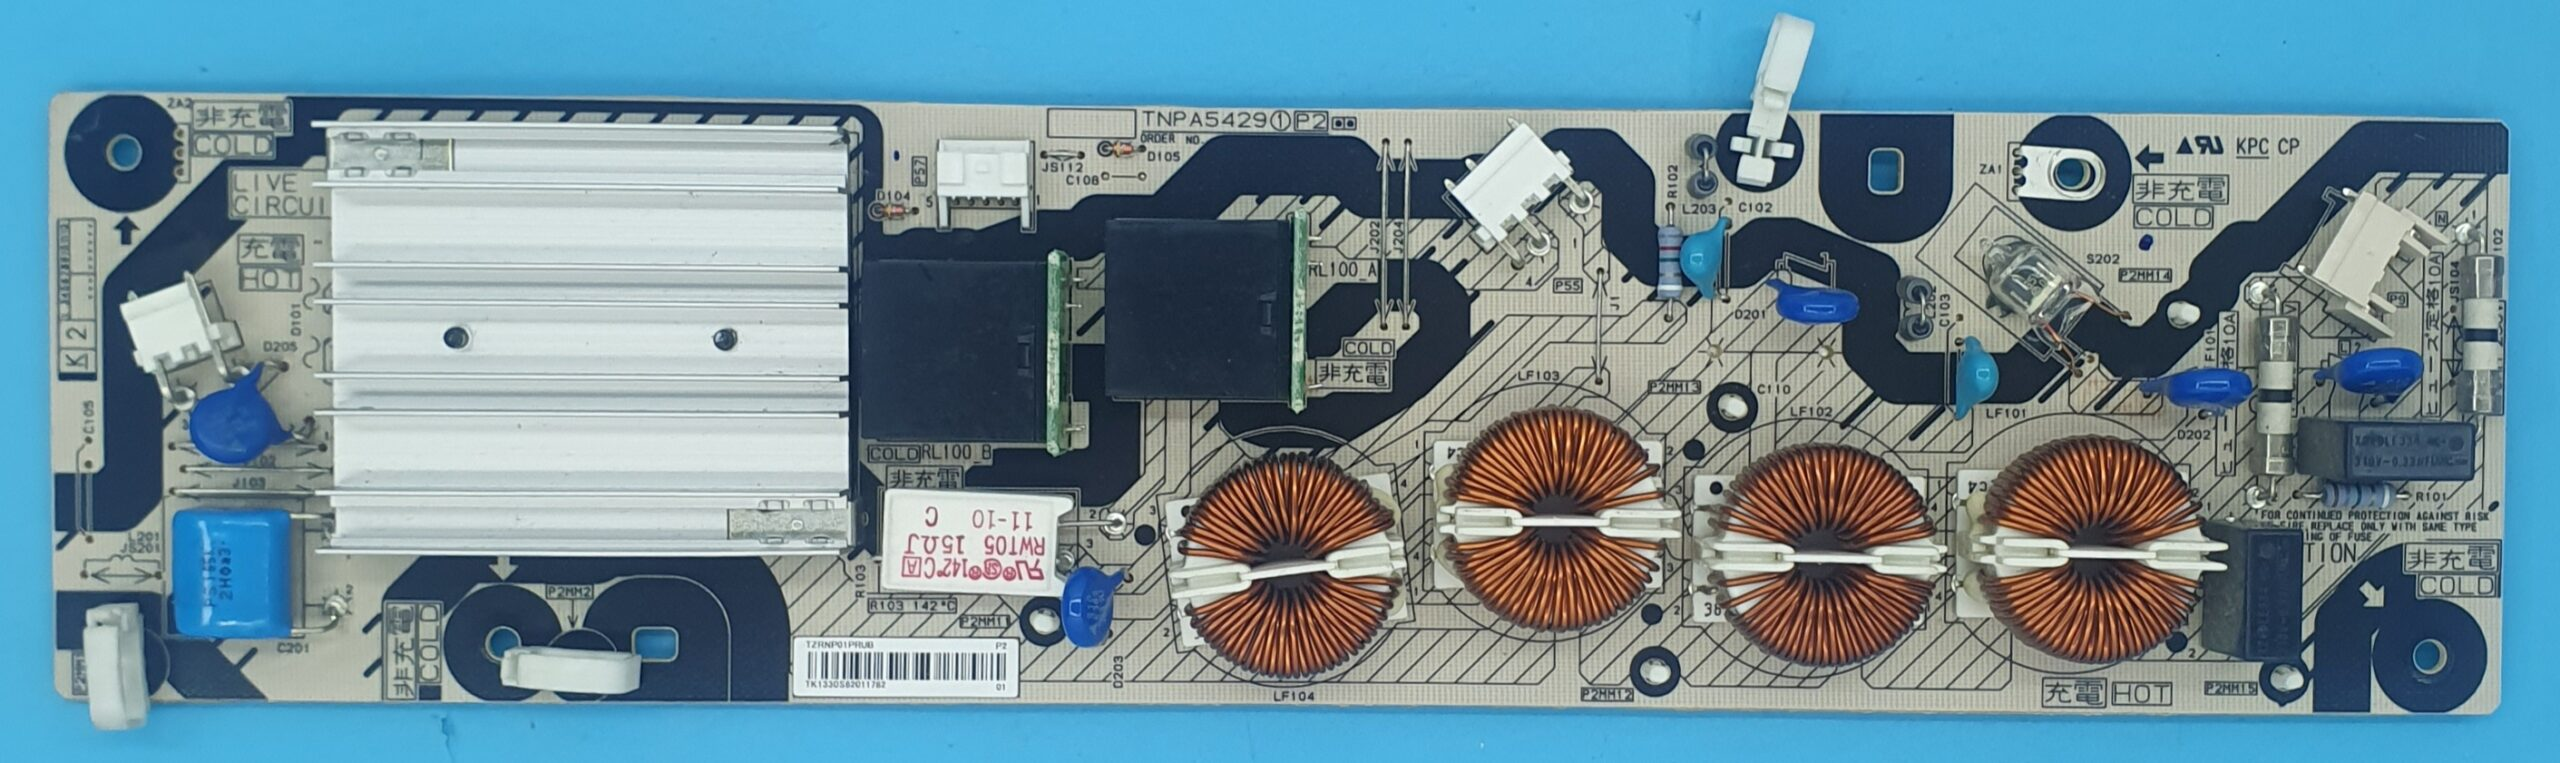 TNPA5429-1-P2 Panasonic Power (KDV DAHİL = 100 TL)